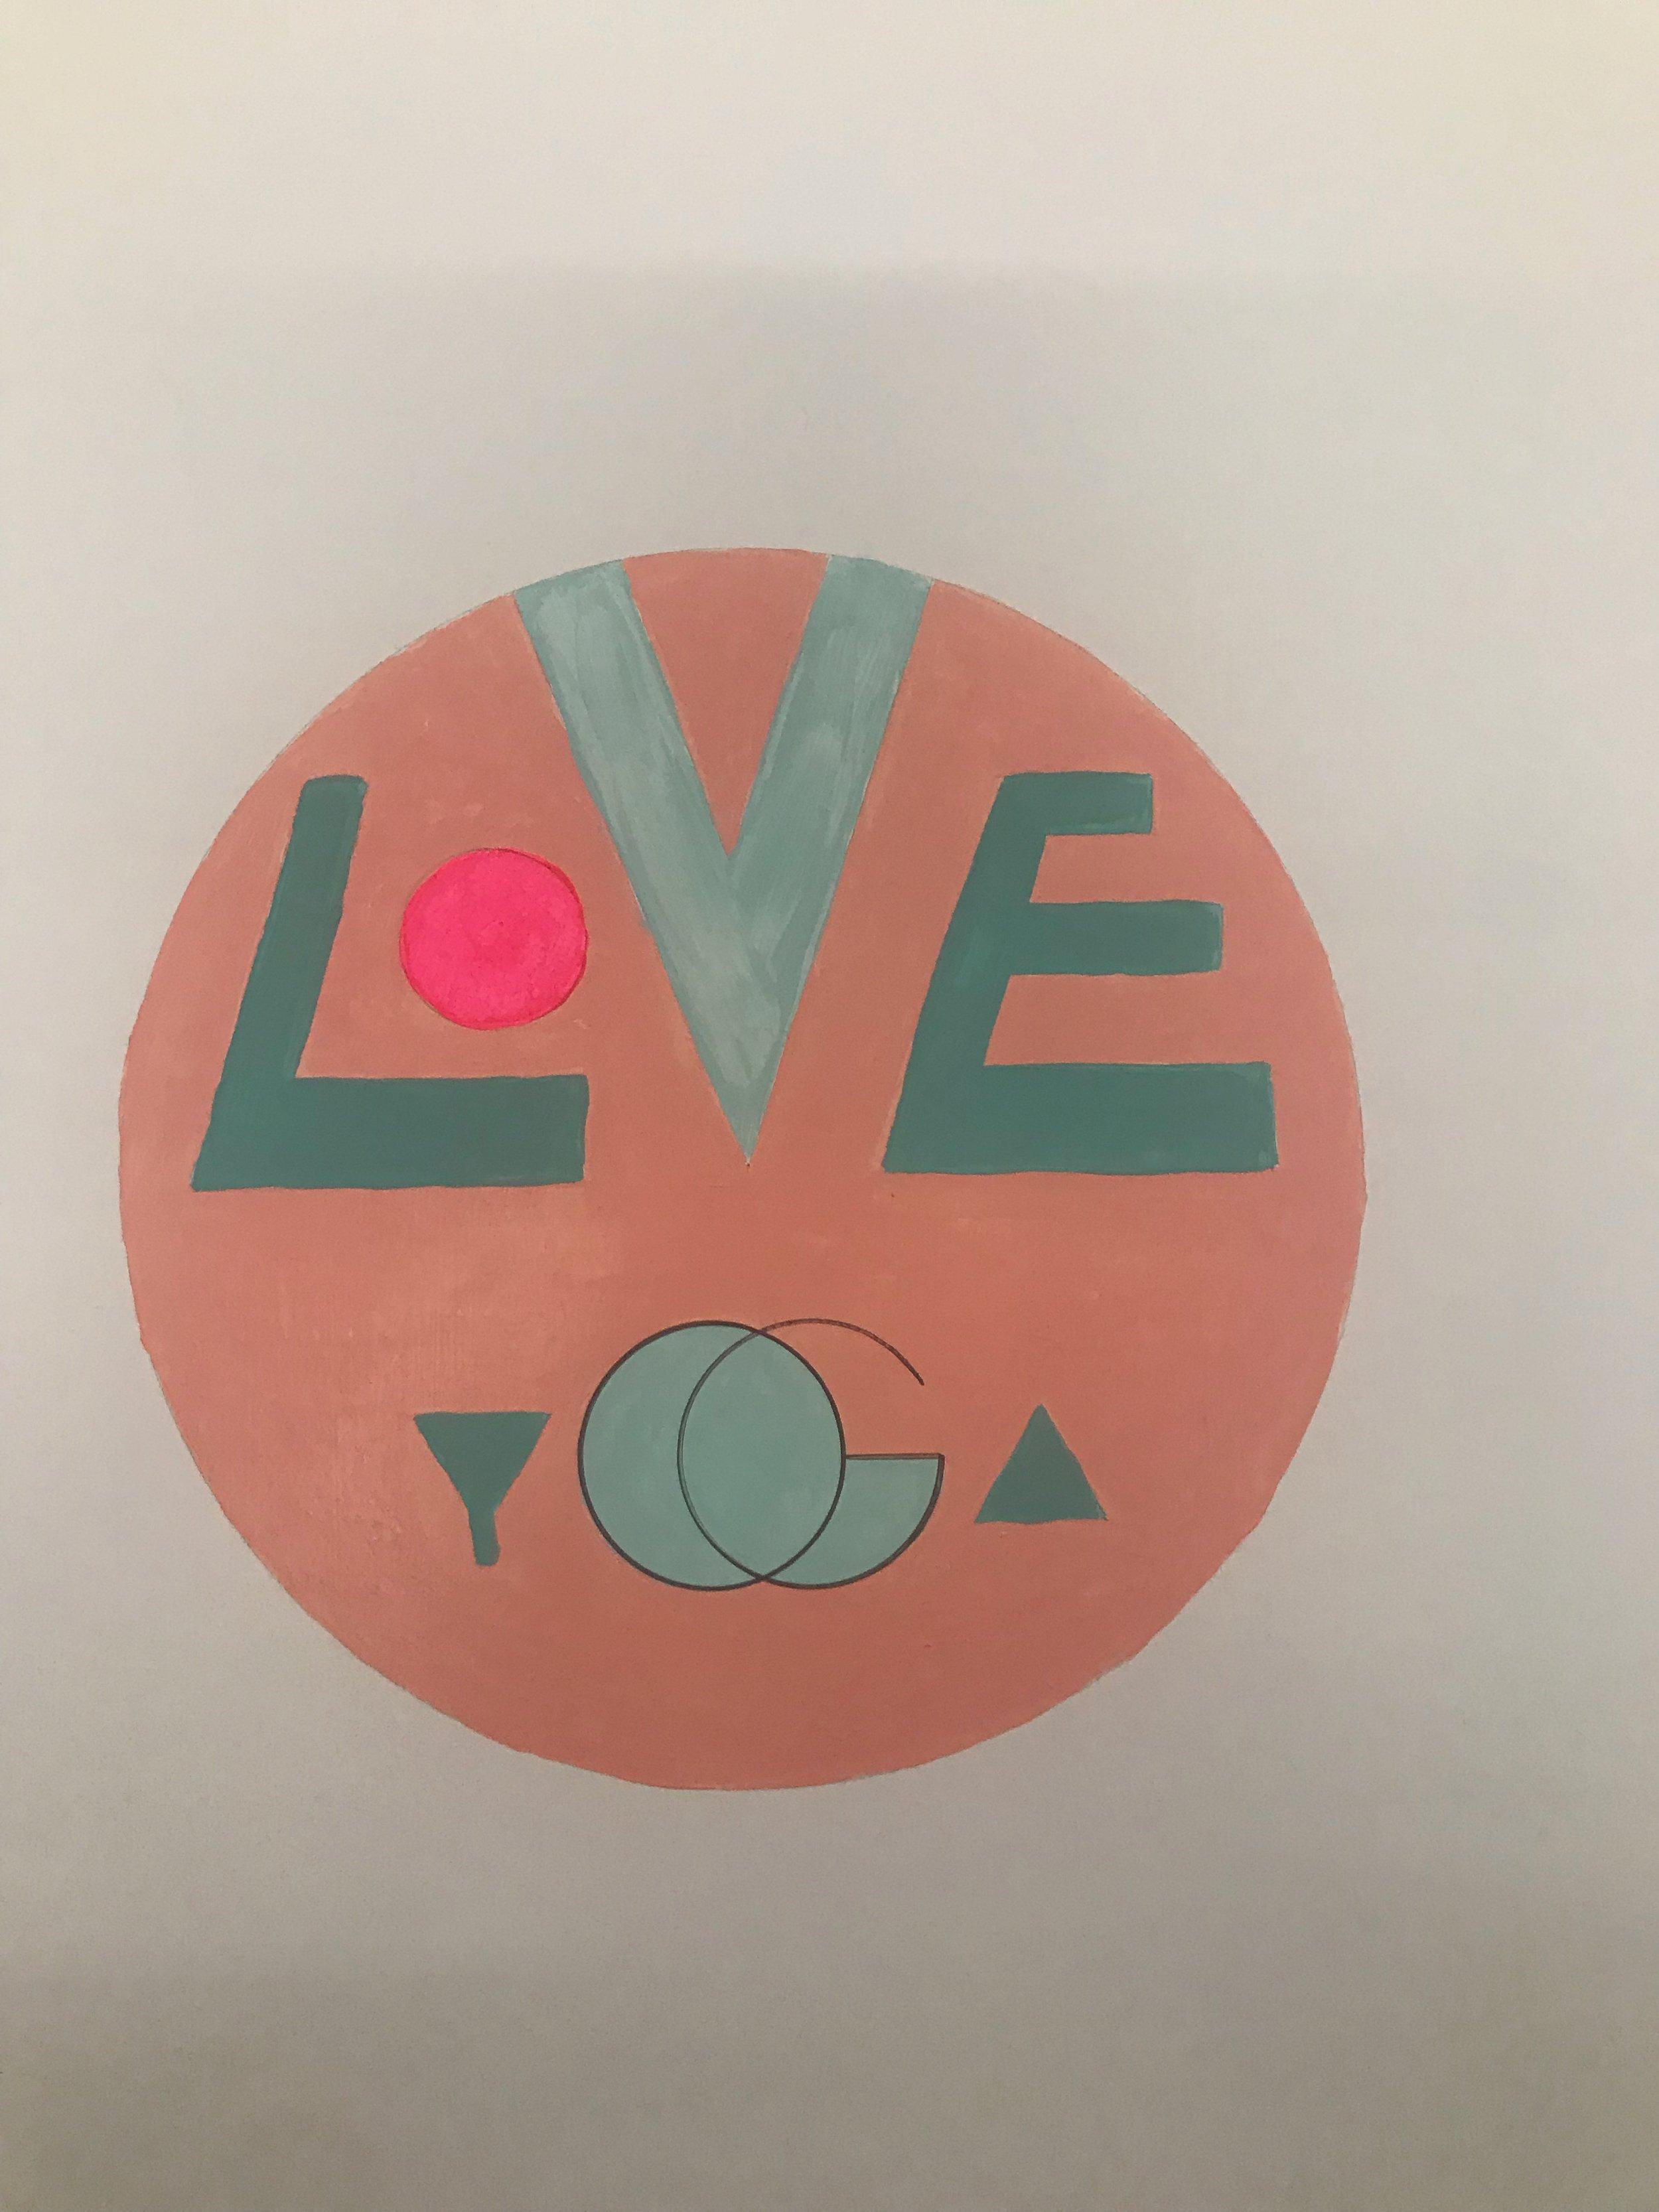 the Love yoga studio in Echo Park